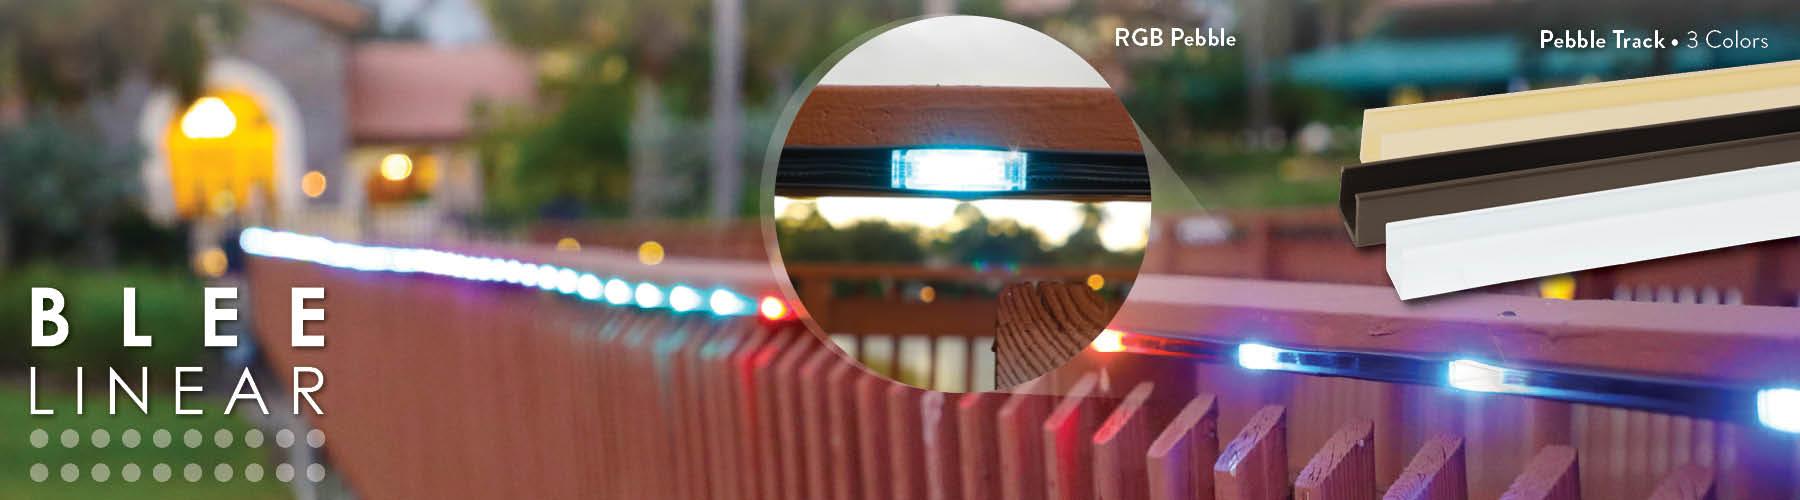 Blee Linear lighting solutions